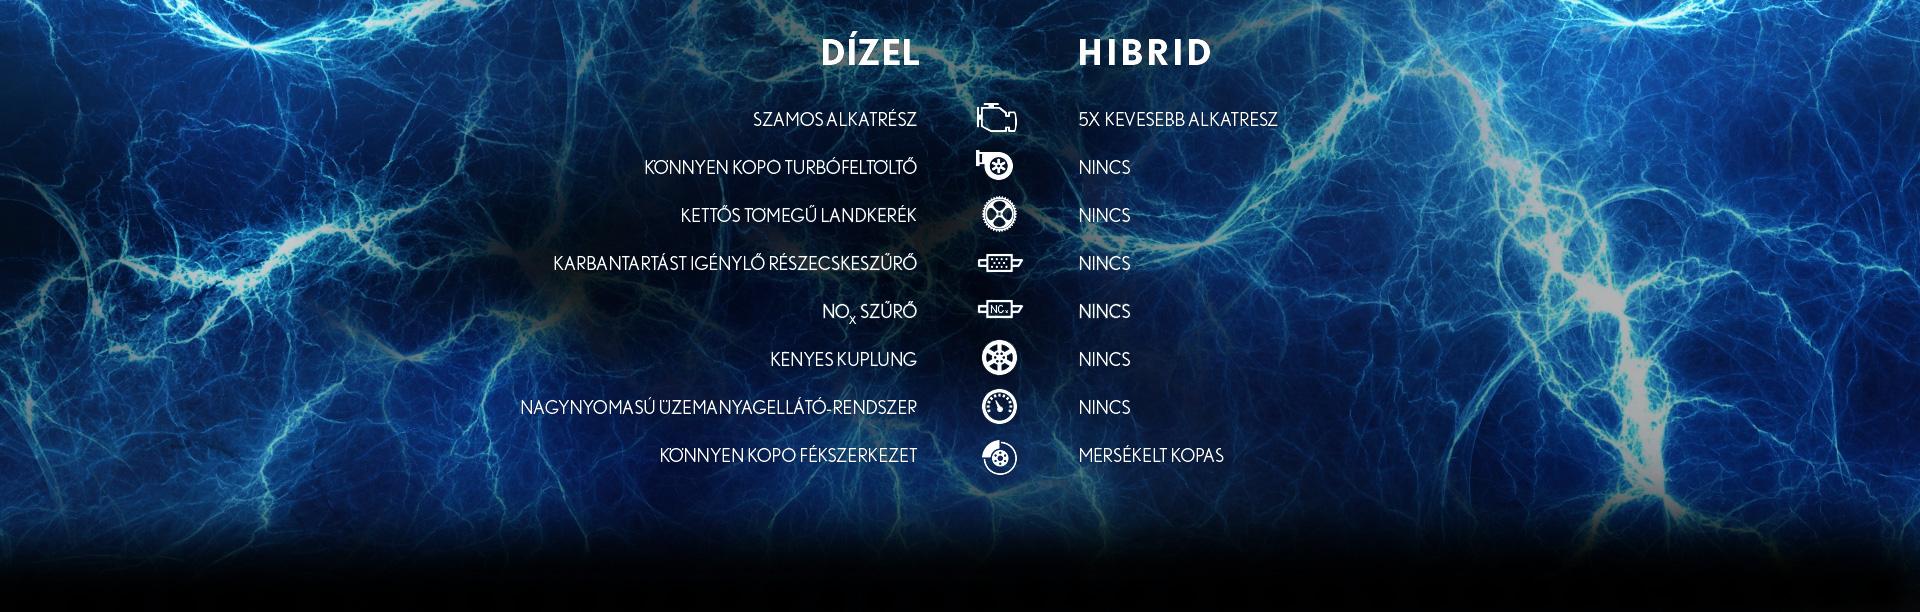 Dizel vs hybrid 1920